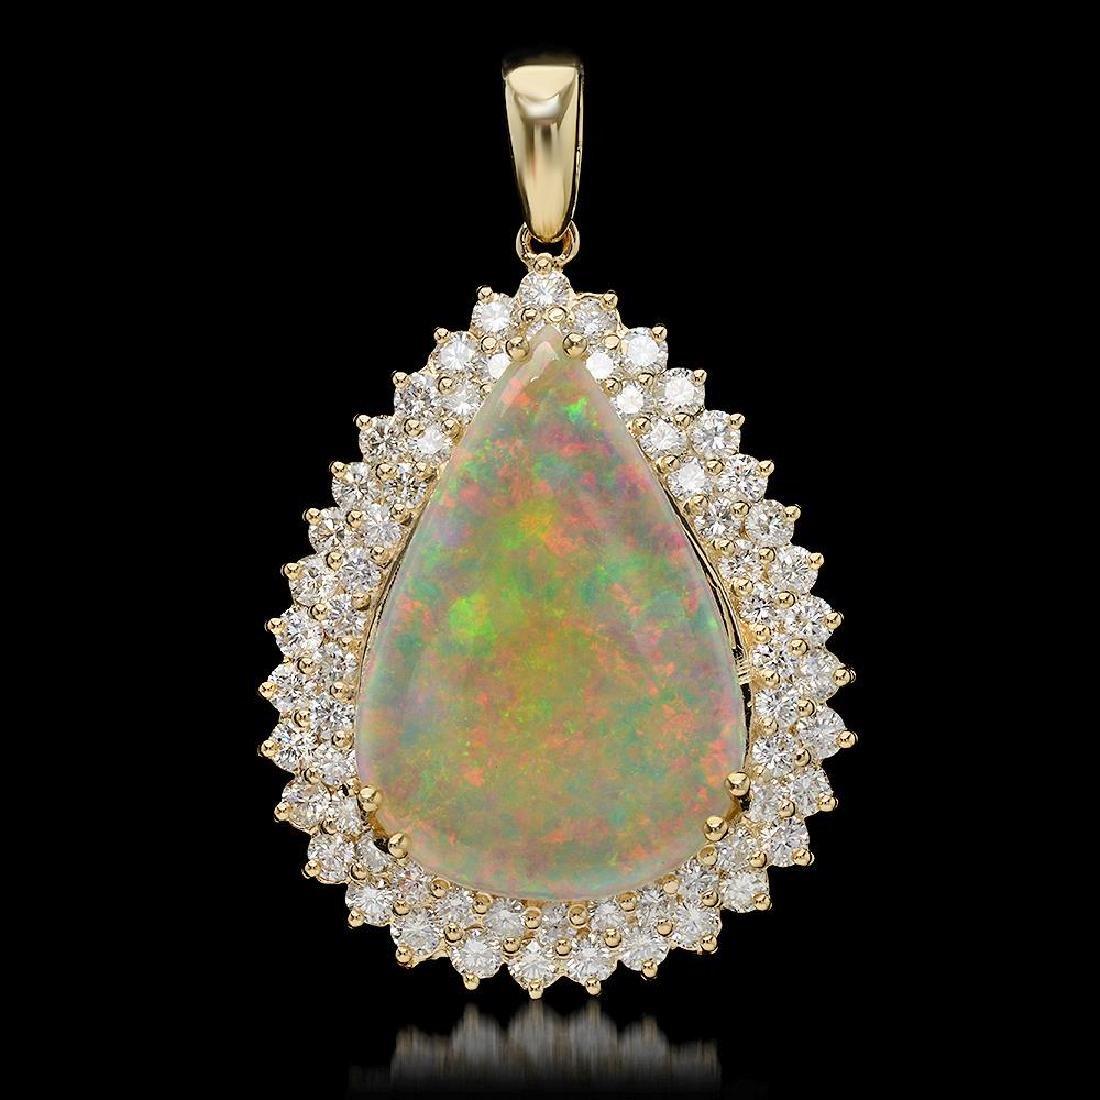 14K Gold 7.12ct Opal & 2.03ct Diamond Pendant